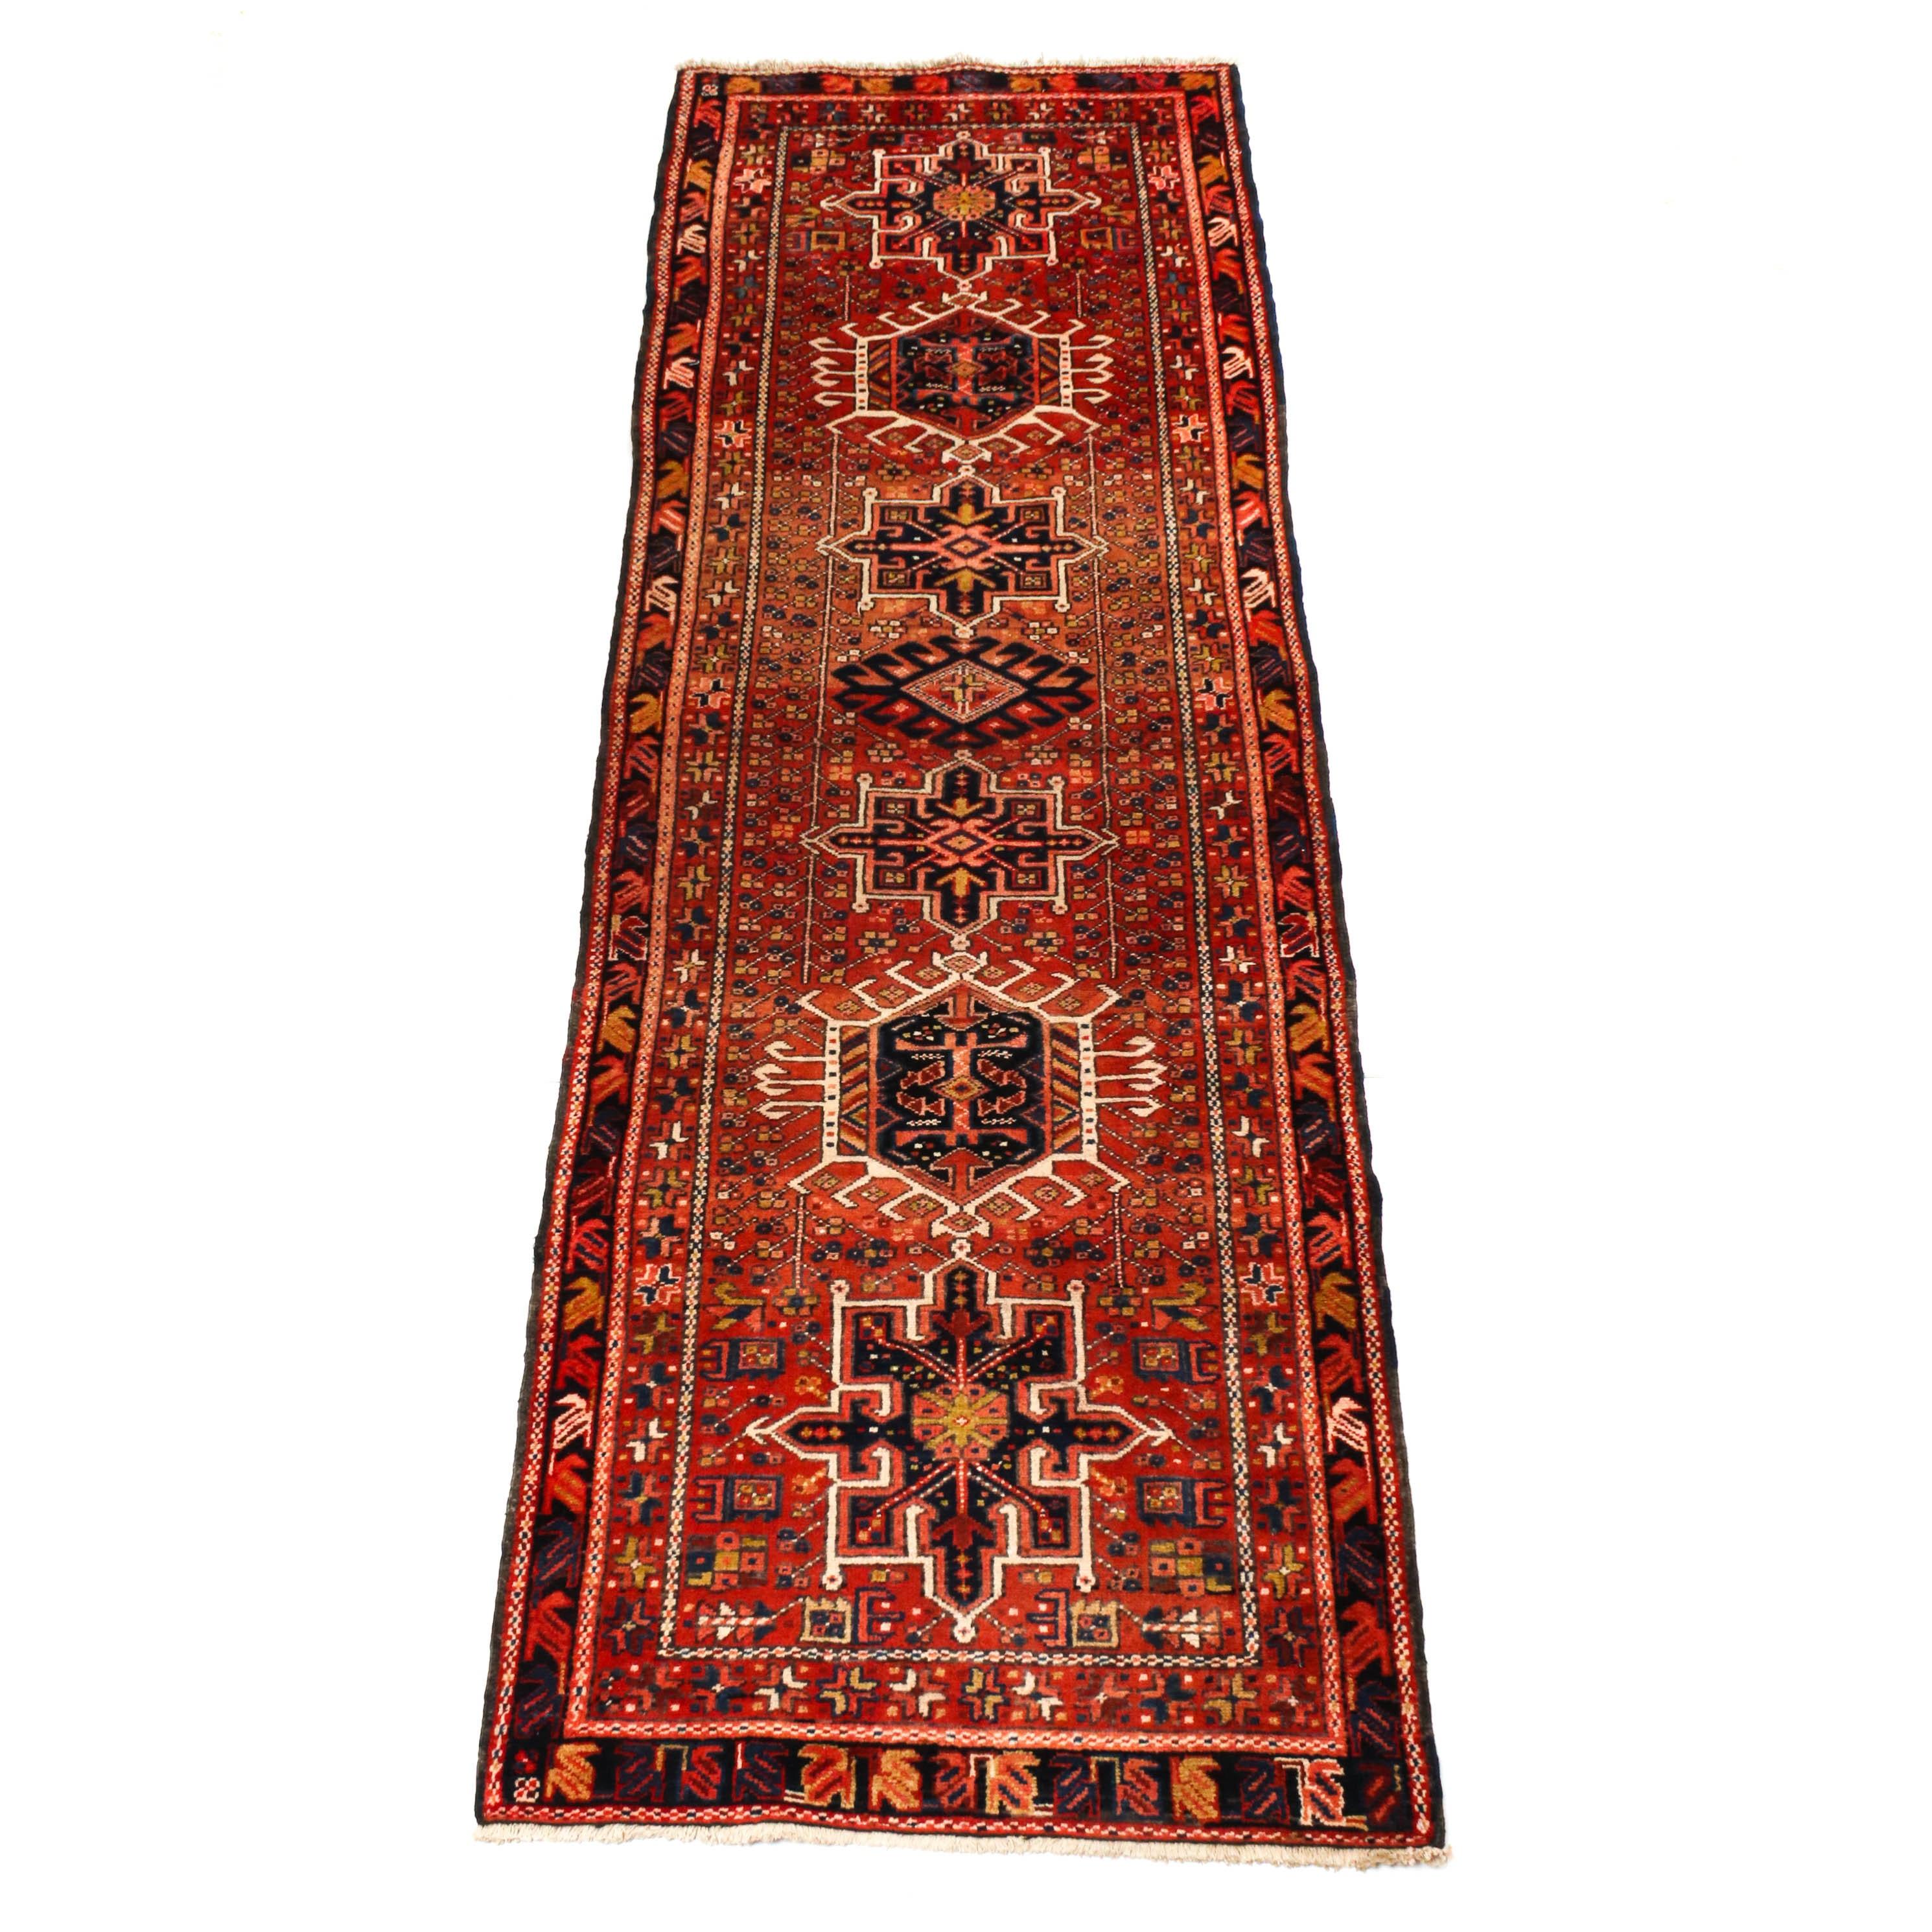 3'6 x 10'8 Hand-Knotted Persian Karaja Long Rug, Circa 1940